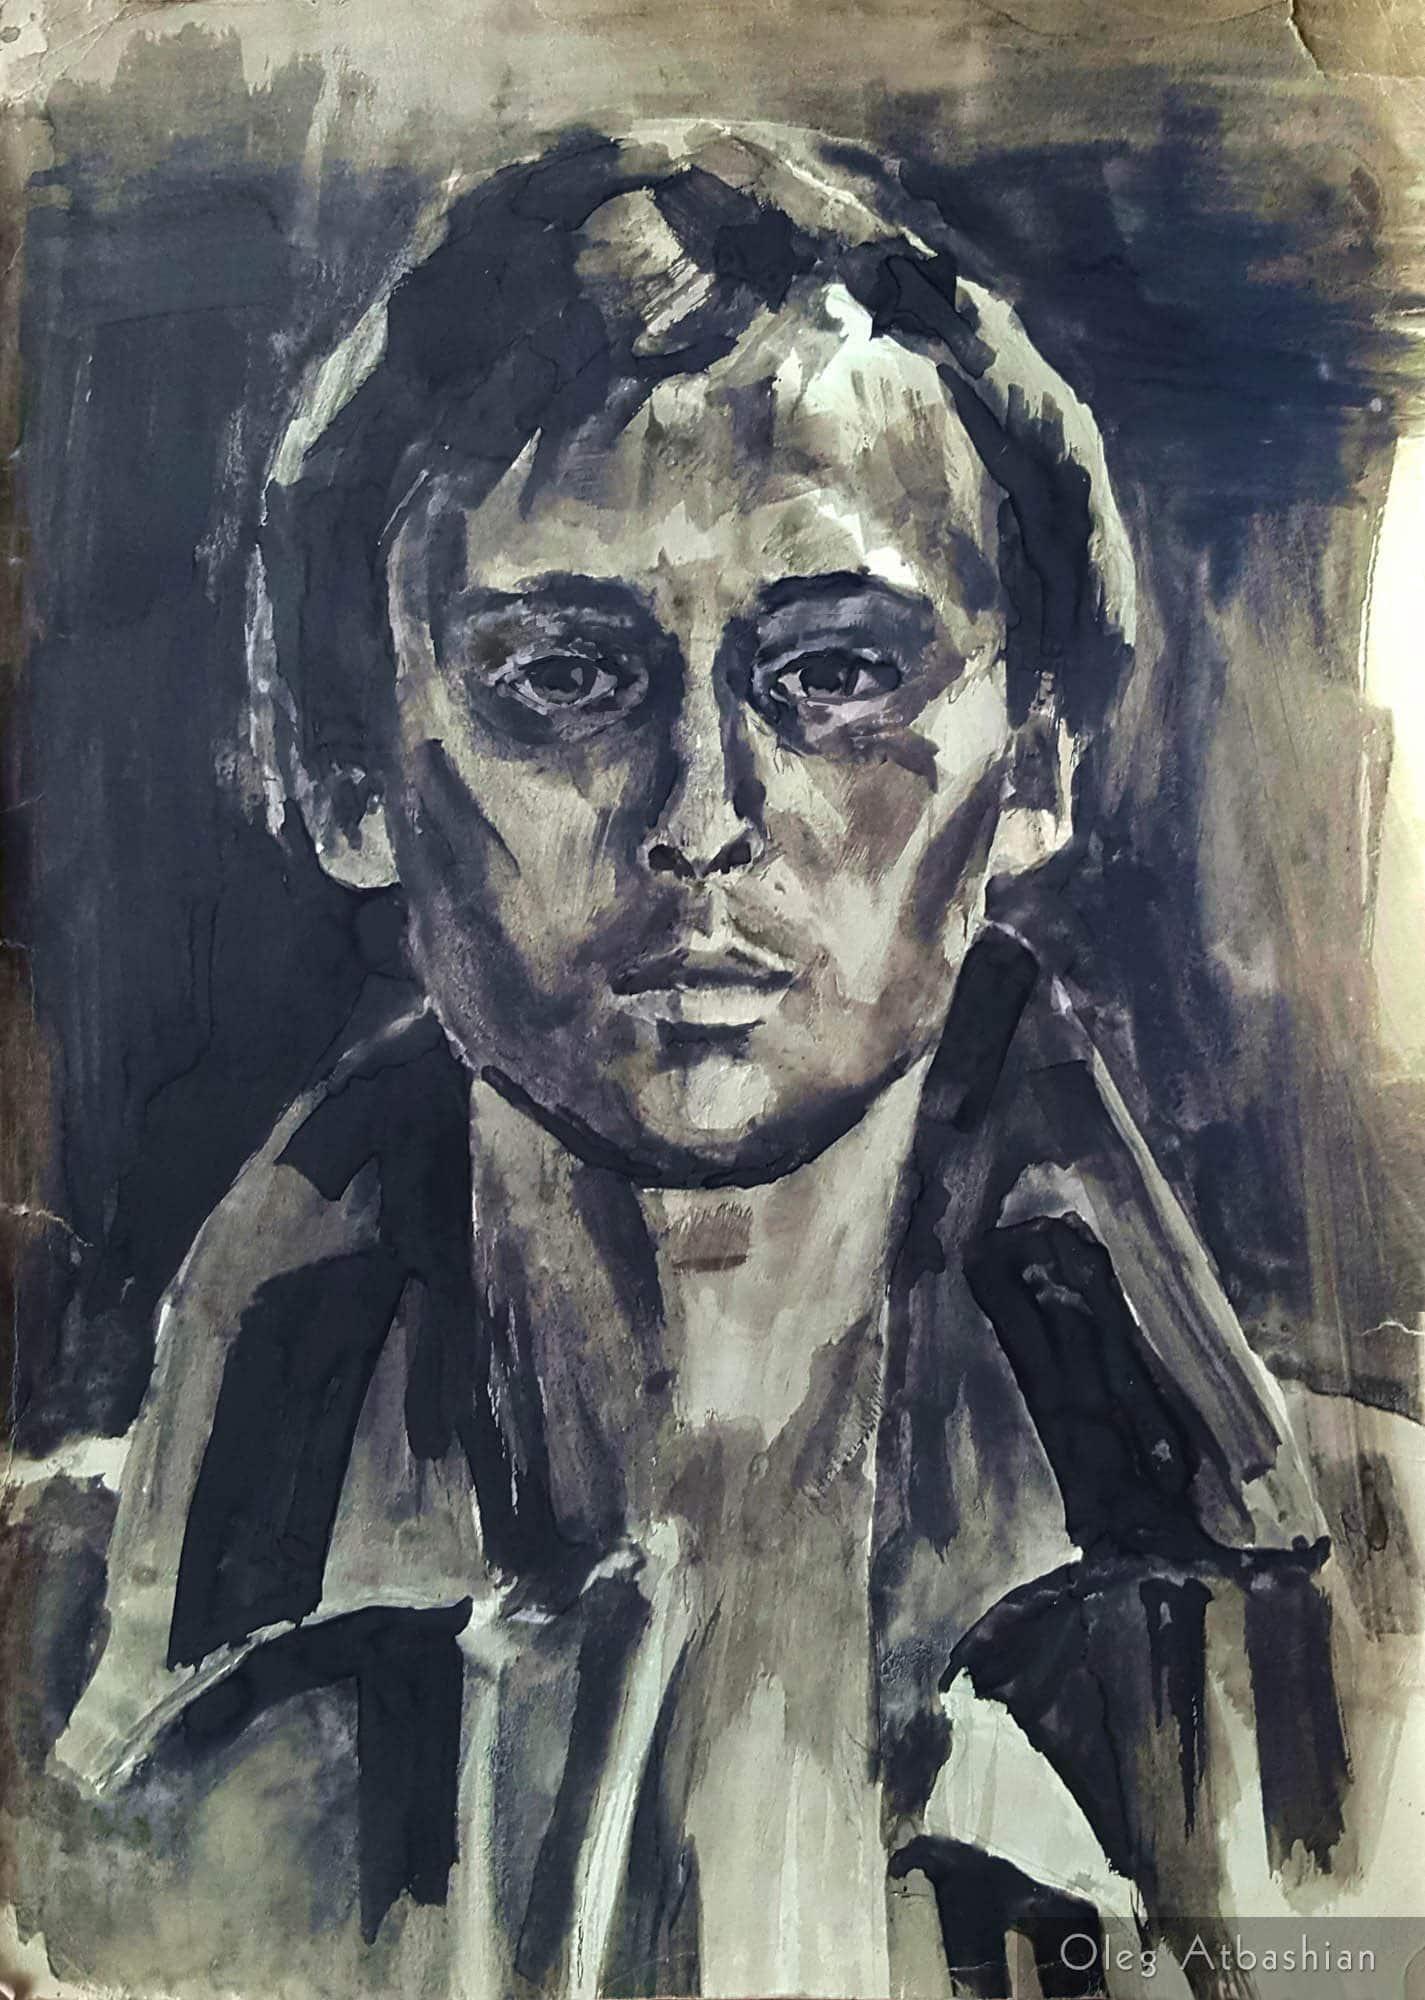 Self Portrait as a Conscript into the Soviet Army